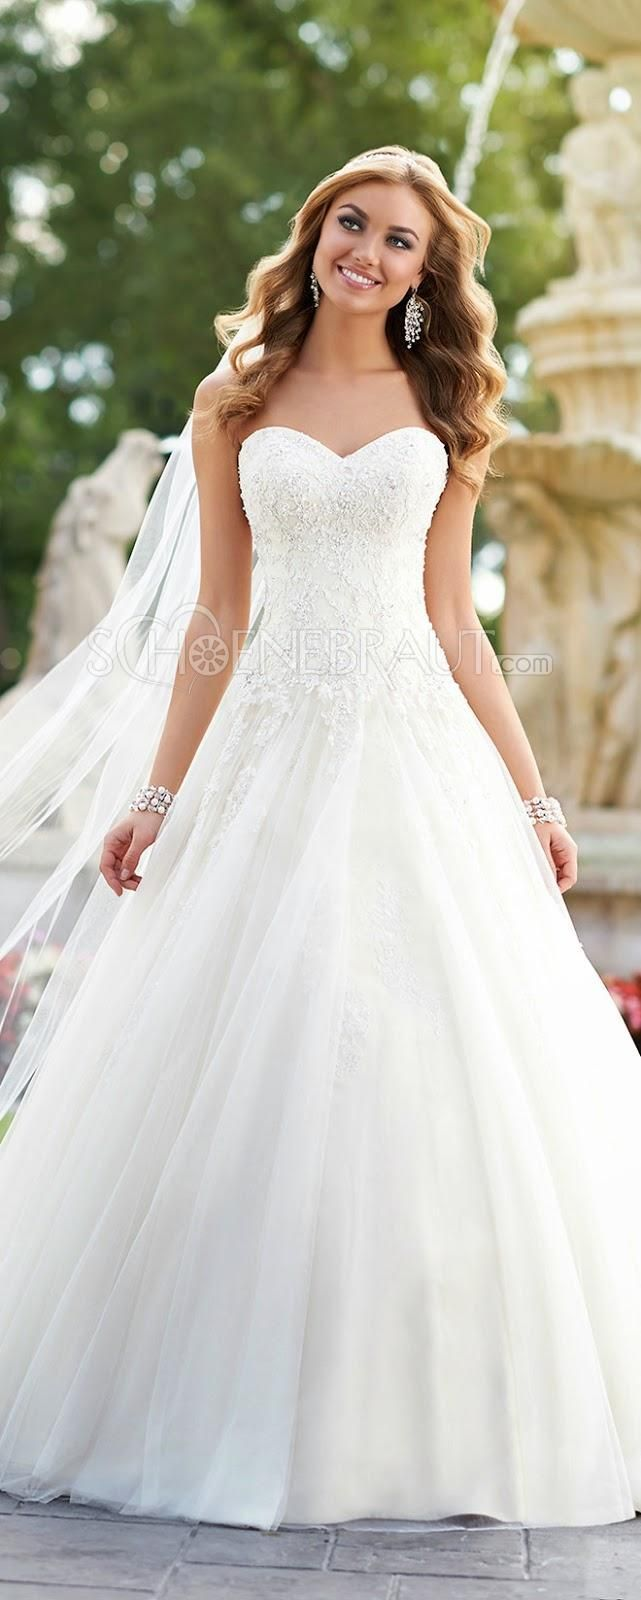 A Linie Spitze Brautkleid mit Straß Lace sweetheart Hochzeitskleid